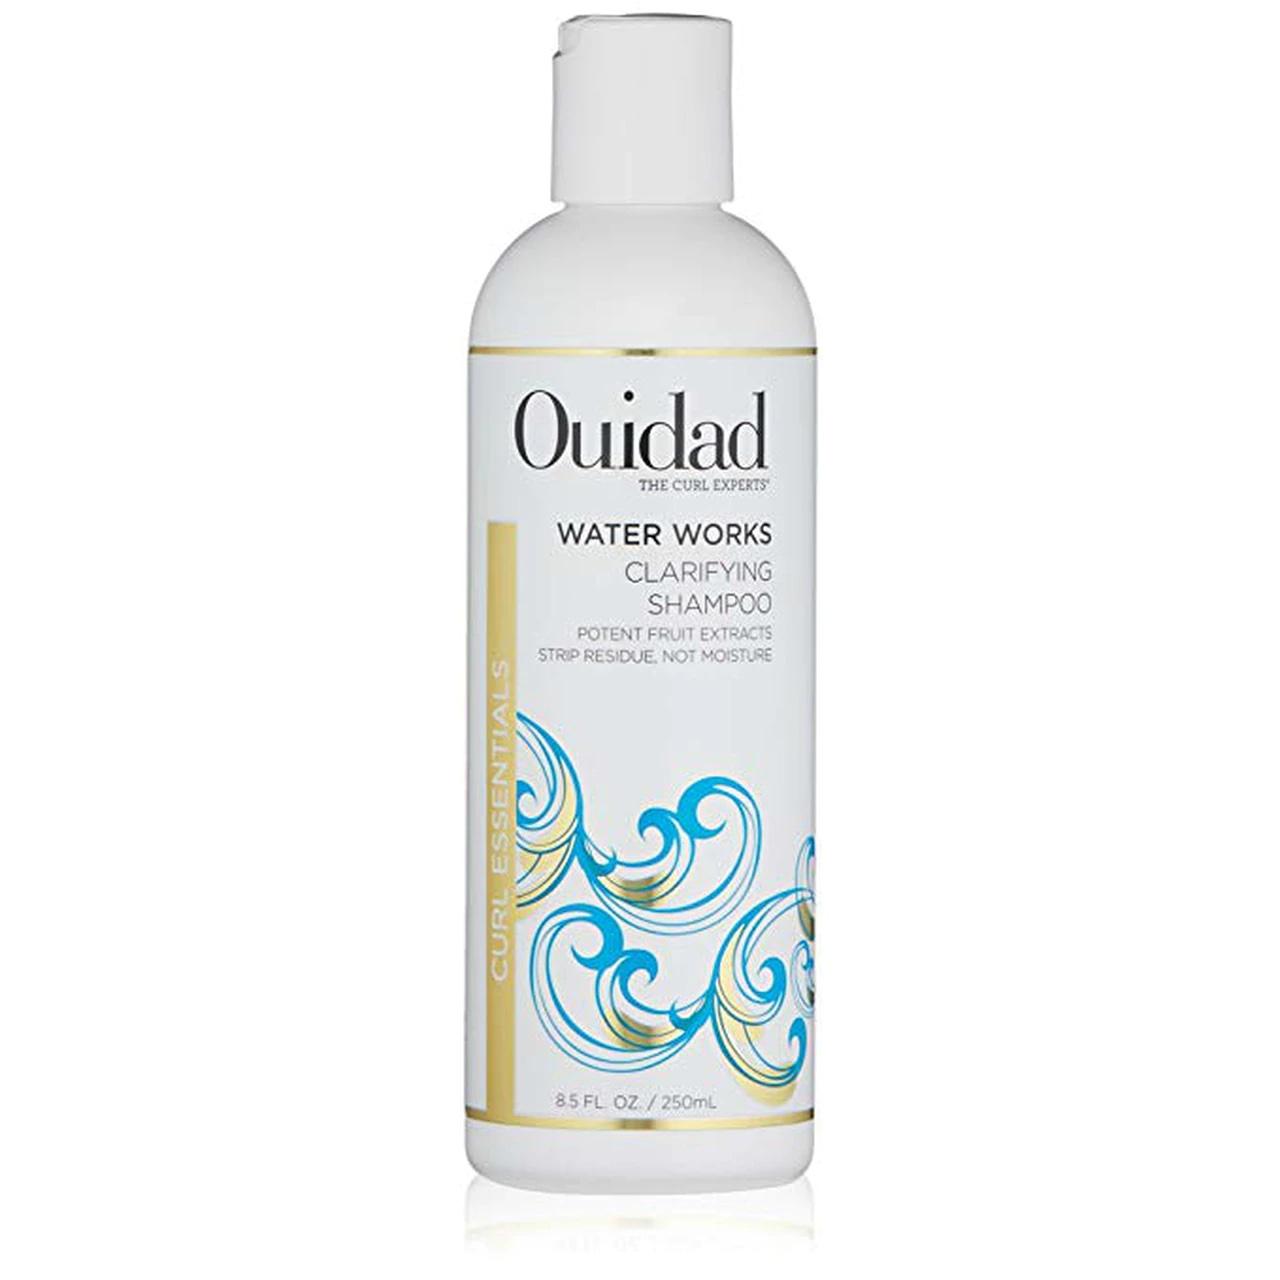 water-works-clarifying-shampoo